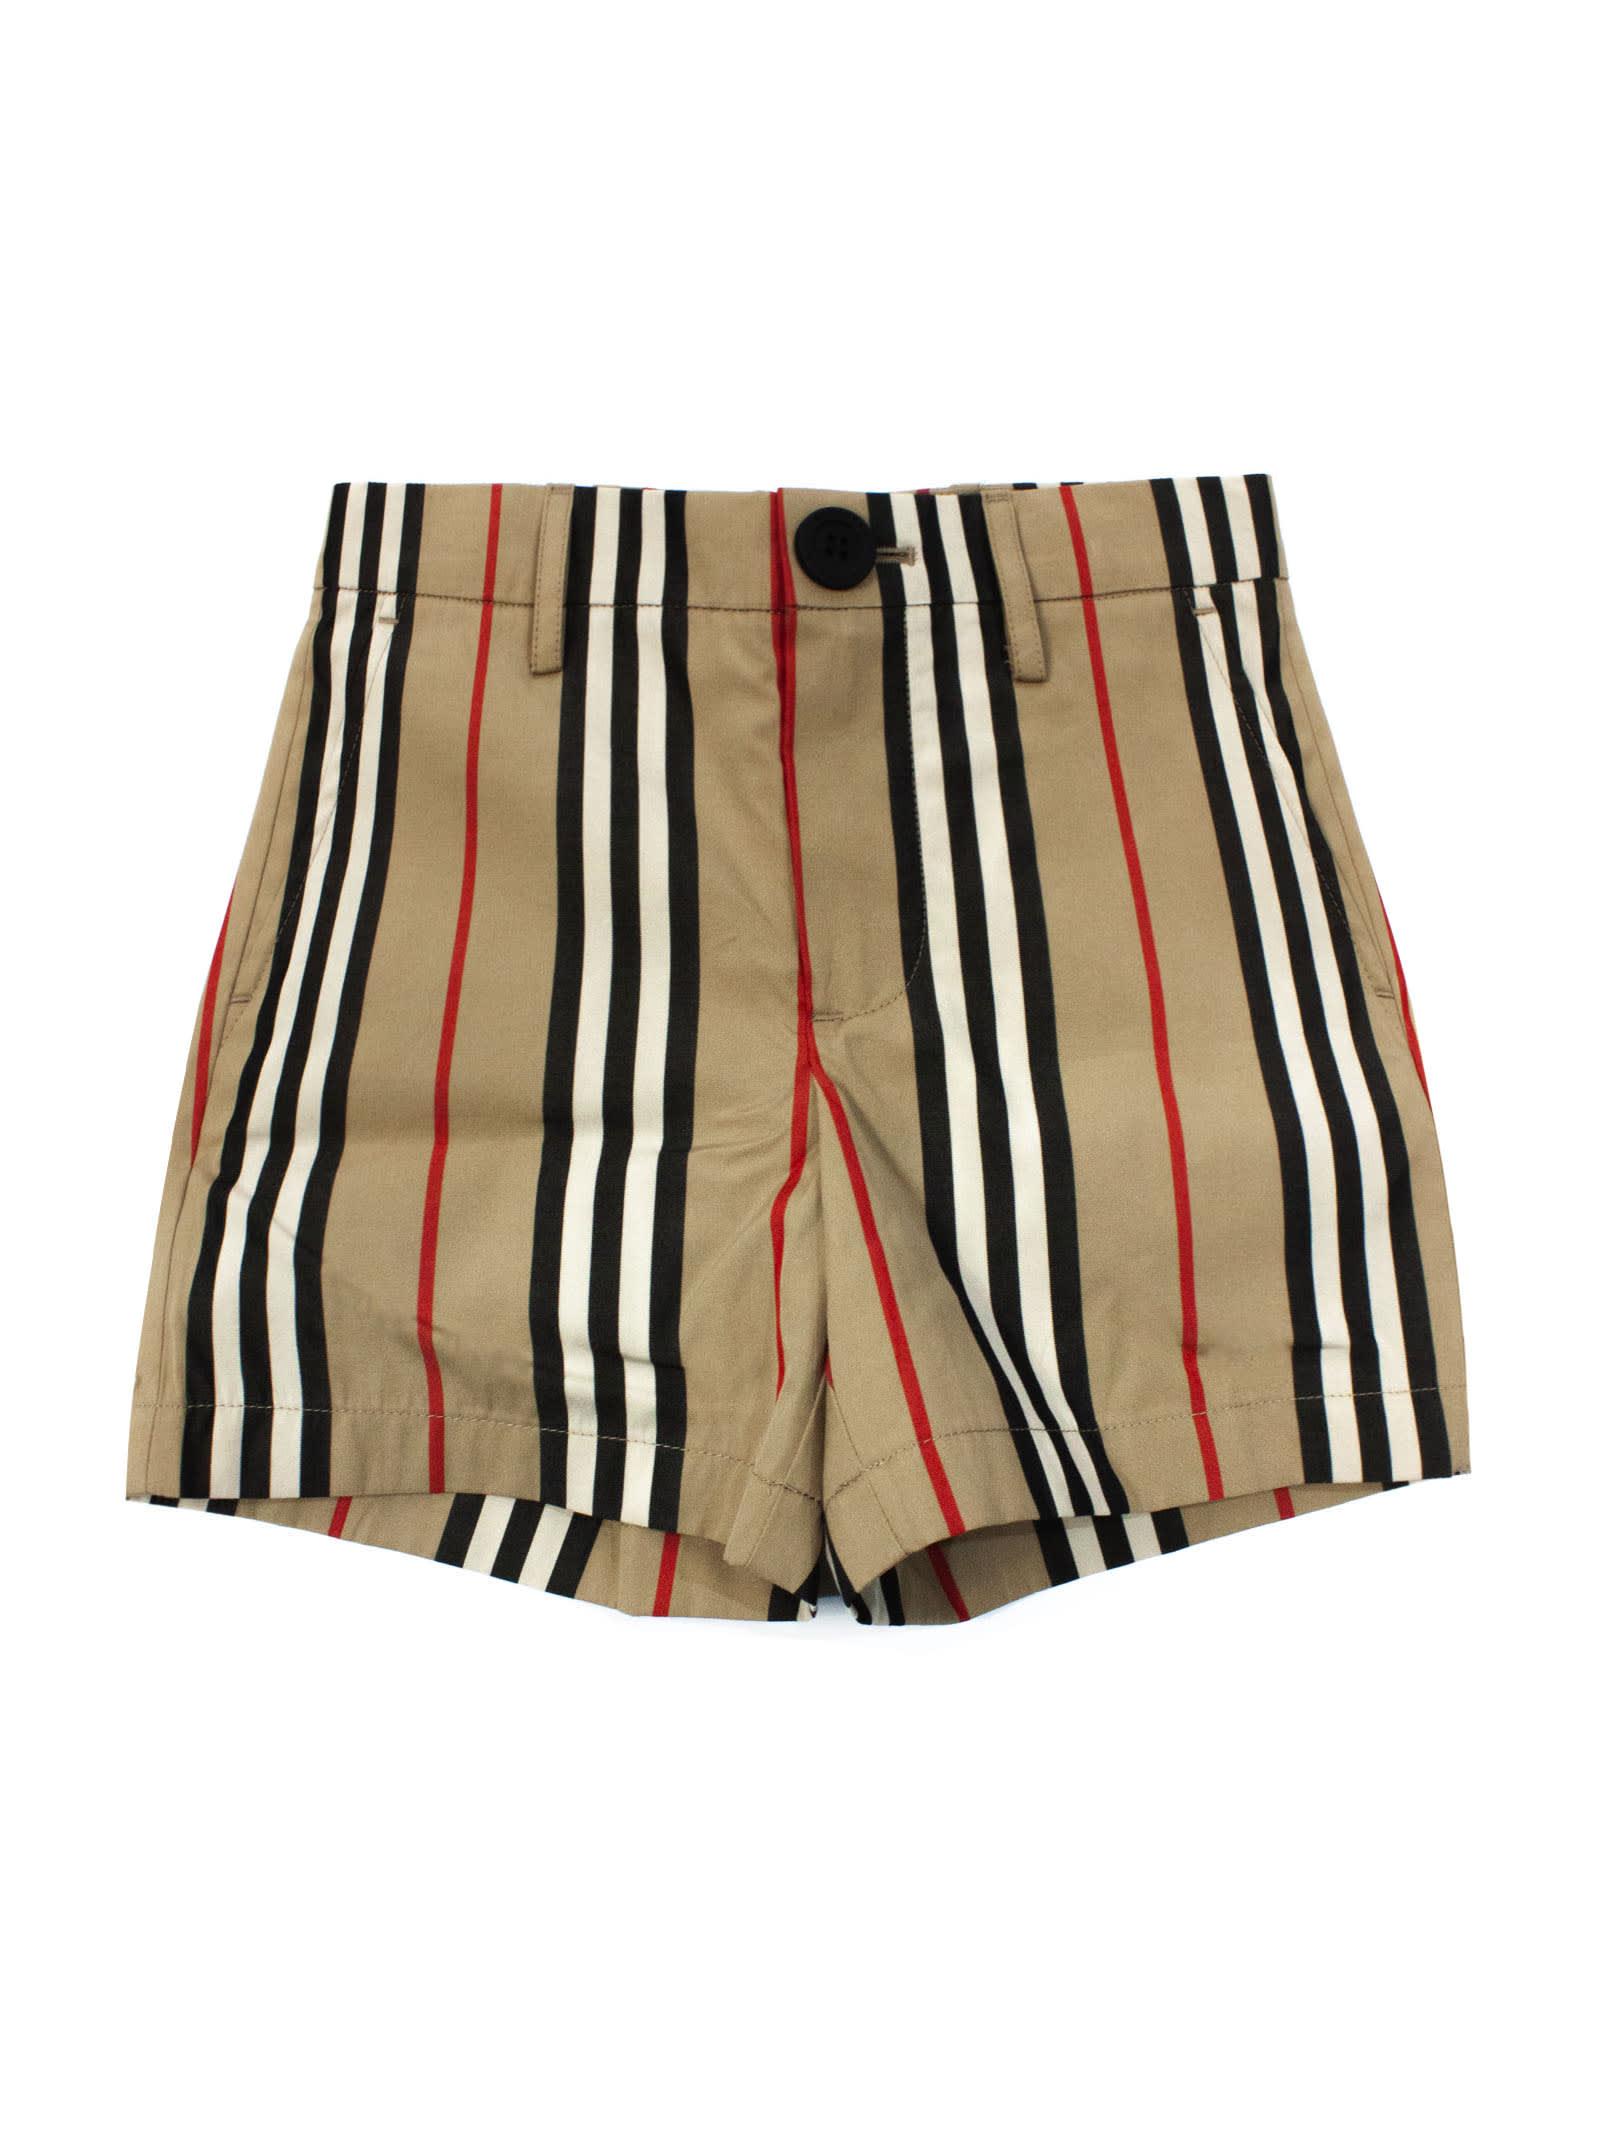 Burberry Kids' Lightweight Cotton-poplin Shorts In Check